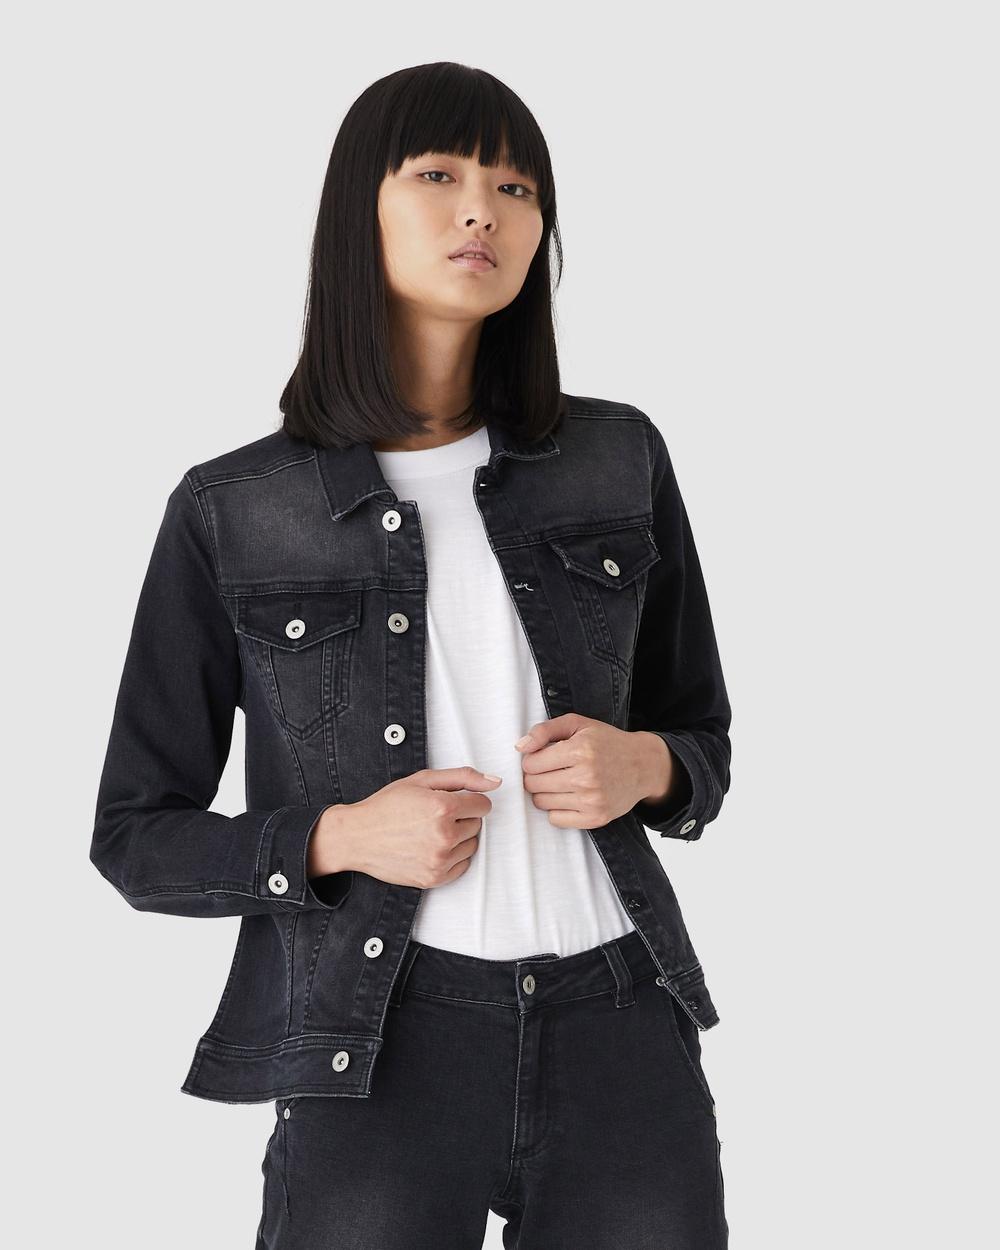 Jac & Mooki Preston Jacket Denim jacket black wash Australia